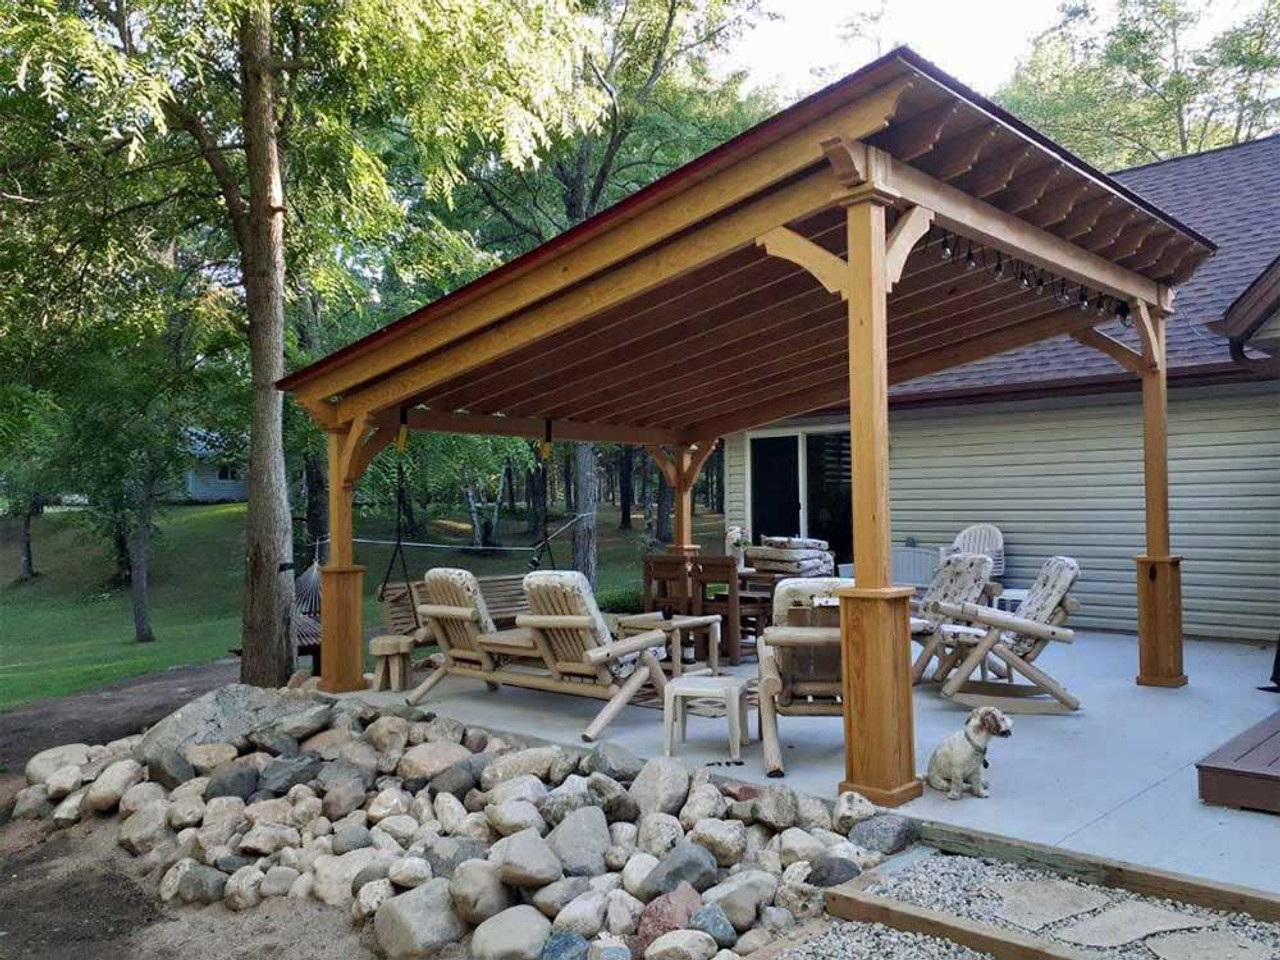 14x16 Lean-To Pavilion pressure treated pine Crivitz Wisconsin